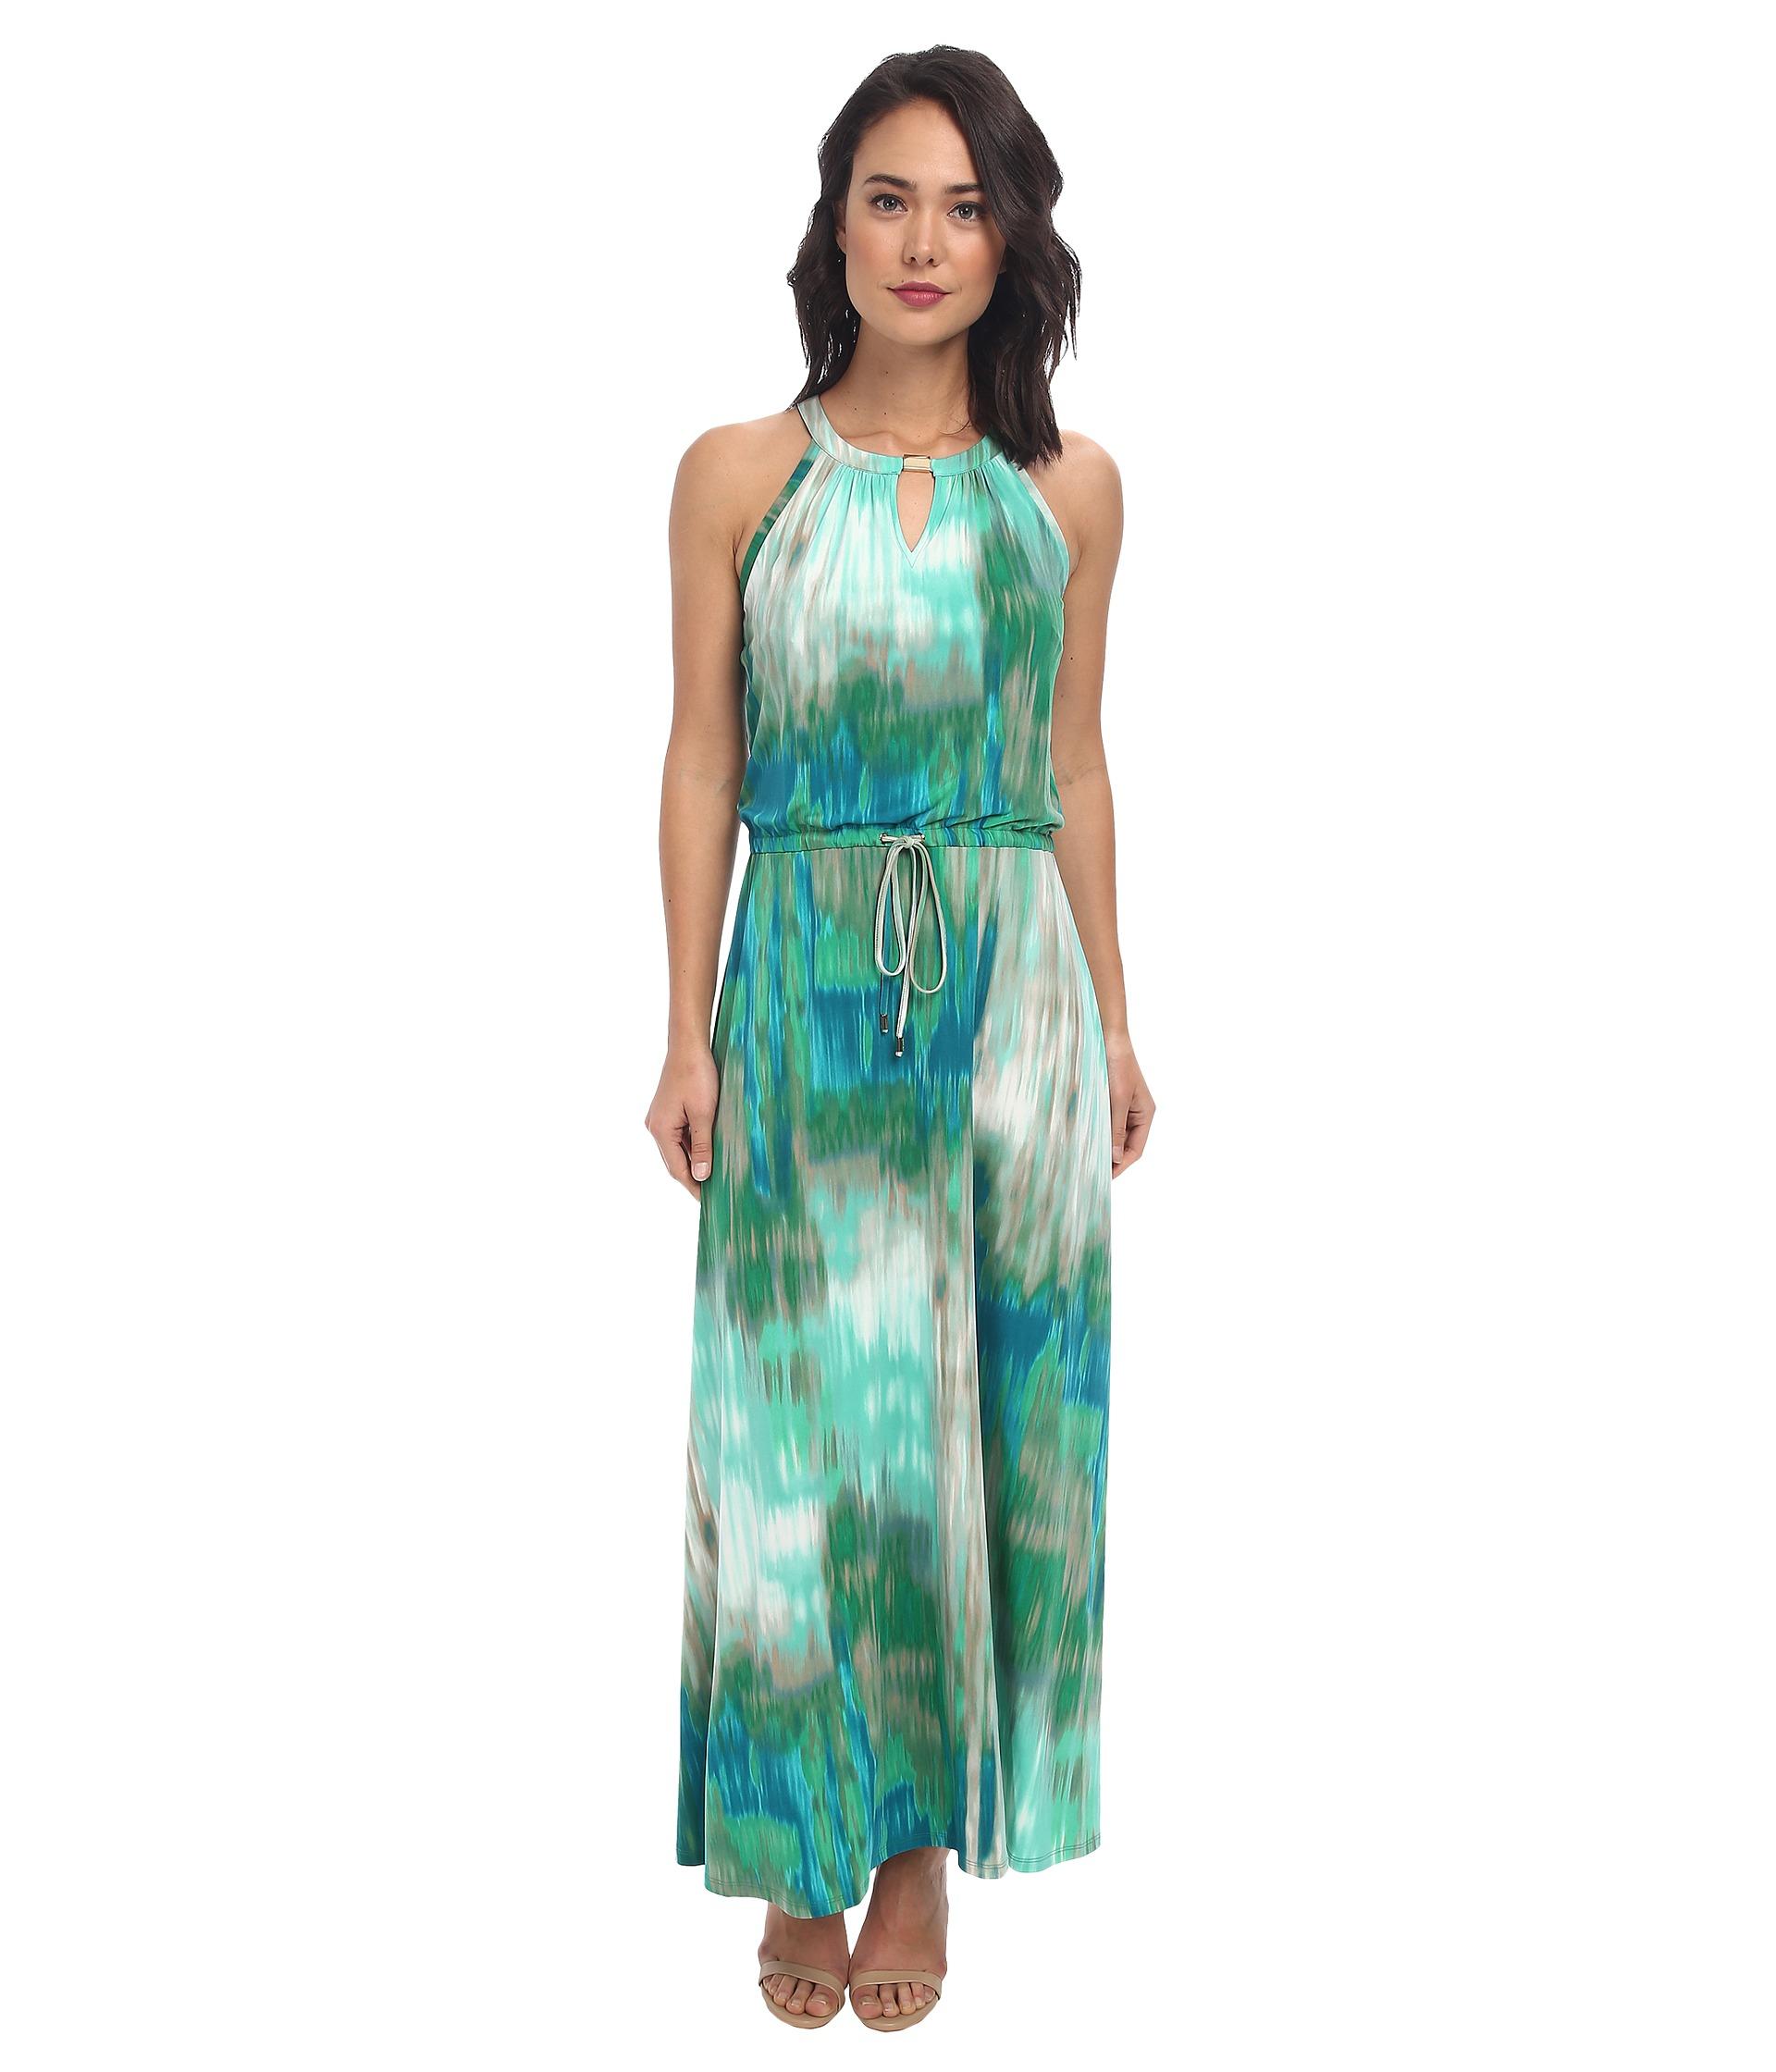 Calvin Klein Leopard Print Maxi Dress | Dress images